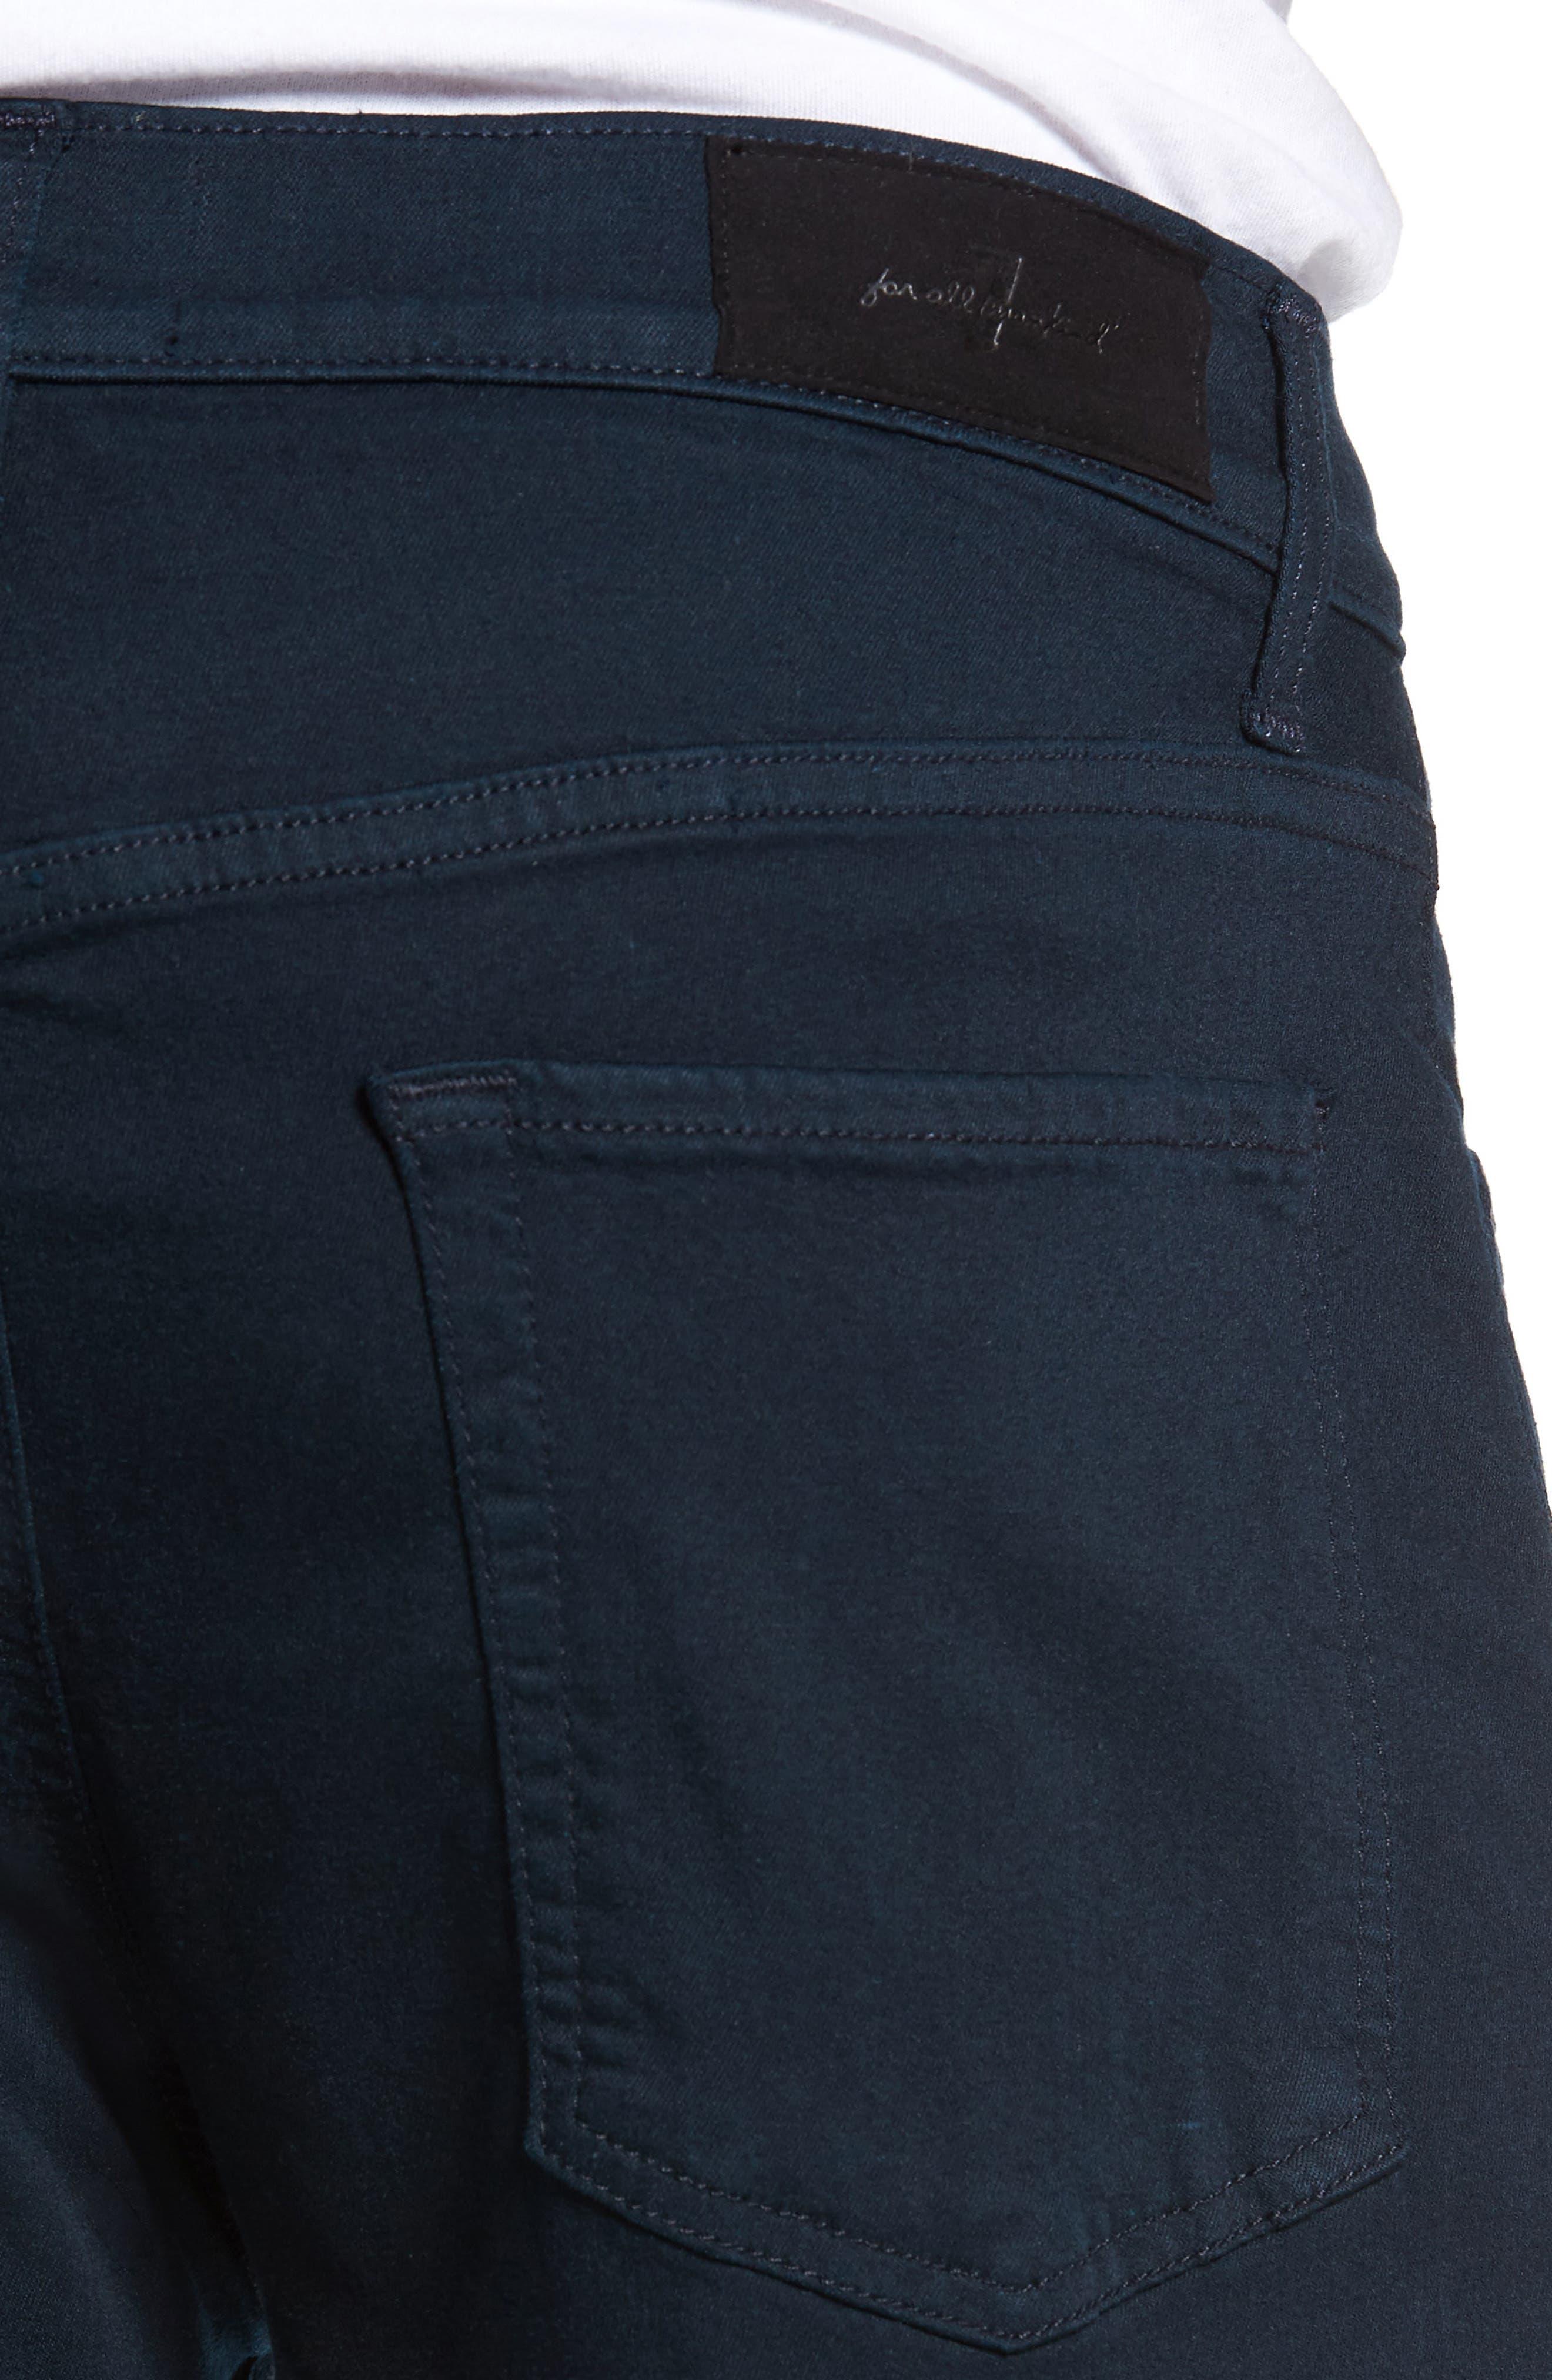 Slimmy Slim Fit Jeans,                             Alternate thumbnail 4, color,